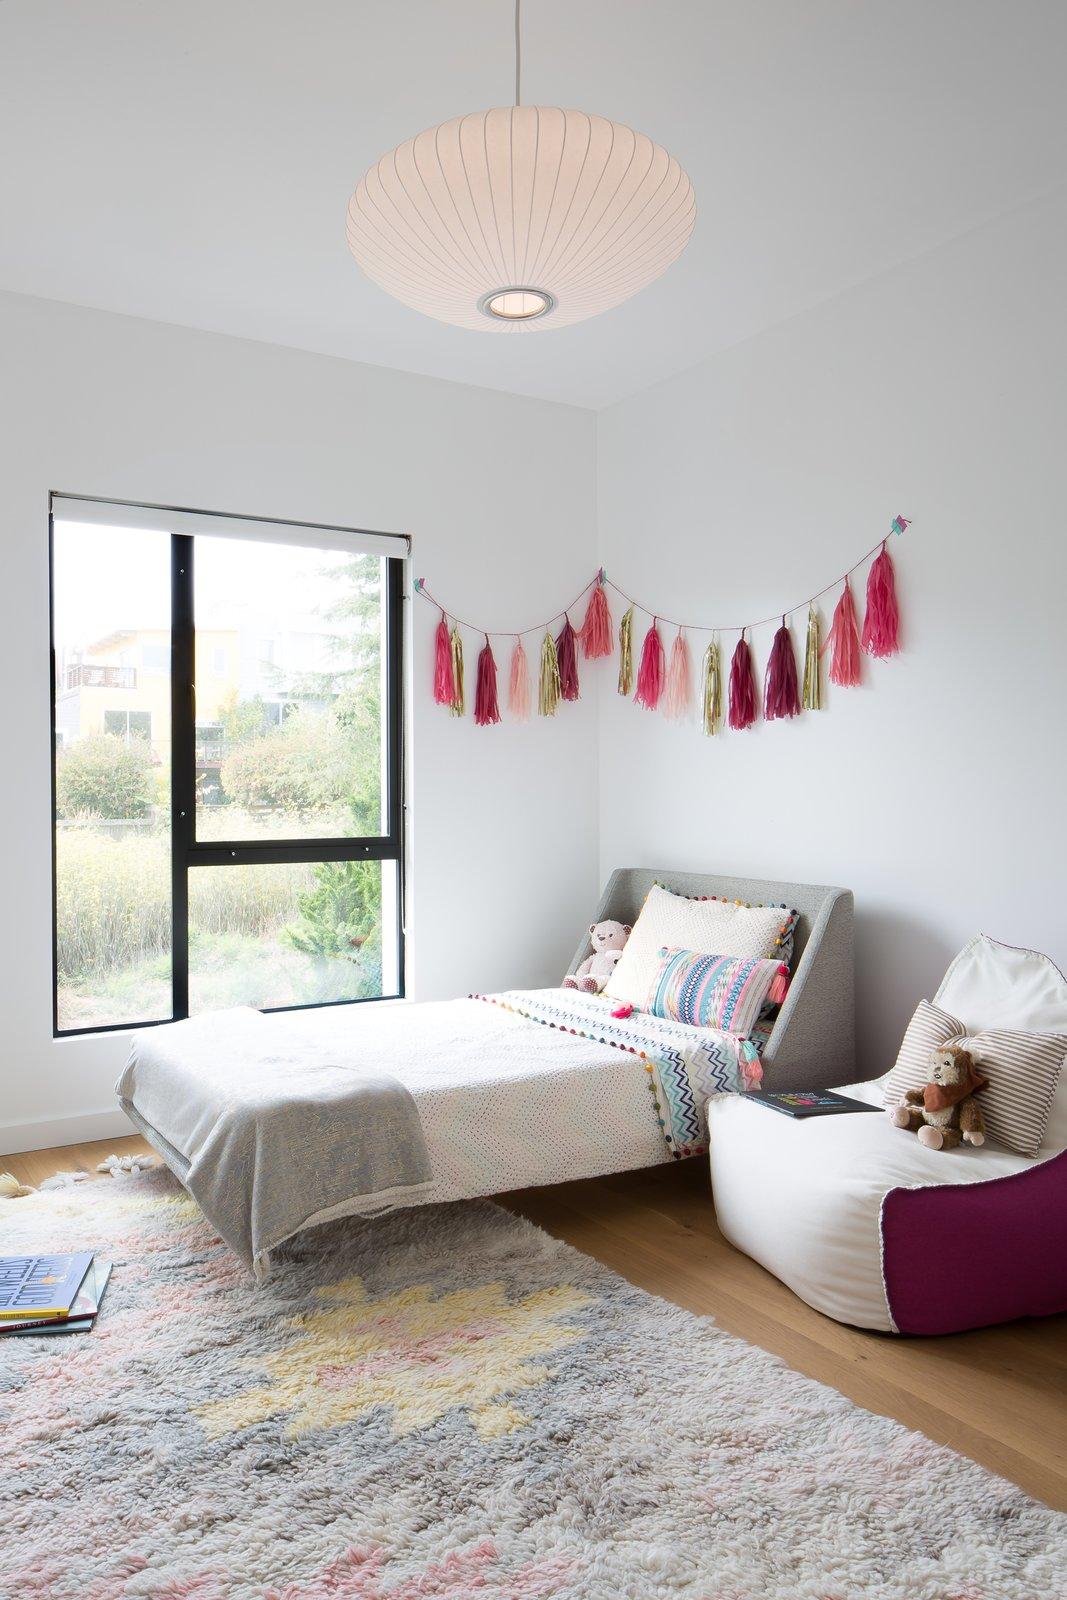 Bedroom  27th Street - Noe Valley by patrick perez/designpad architecture